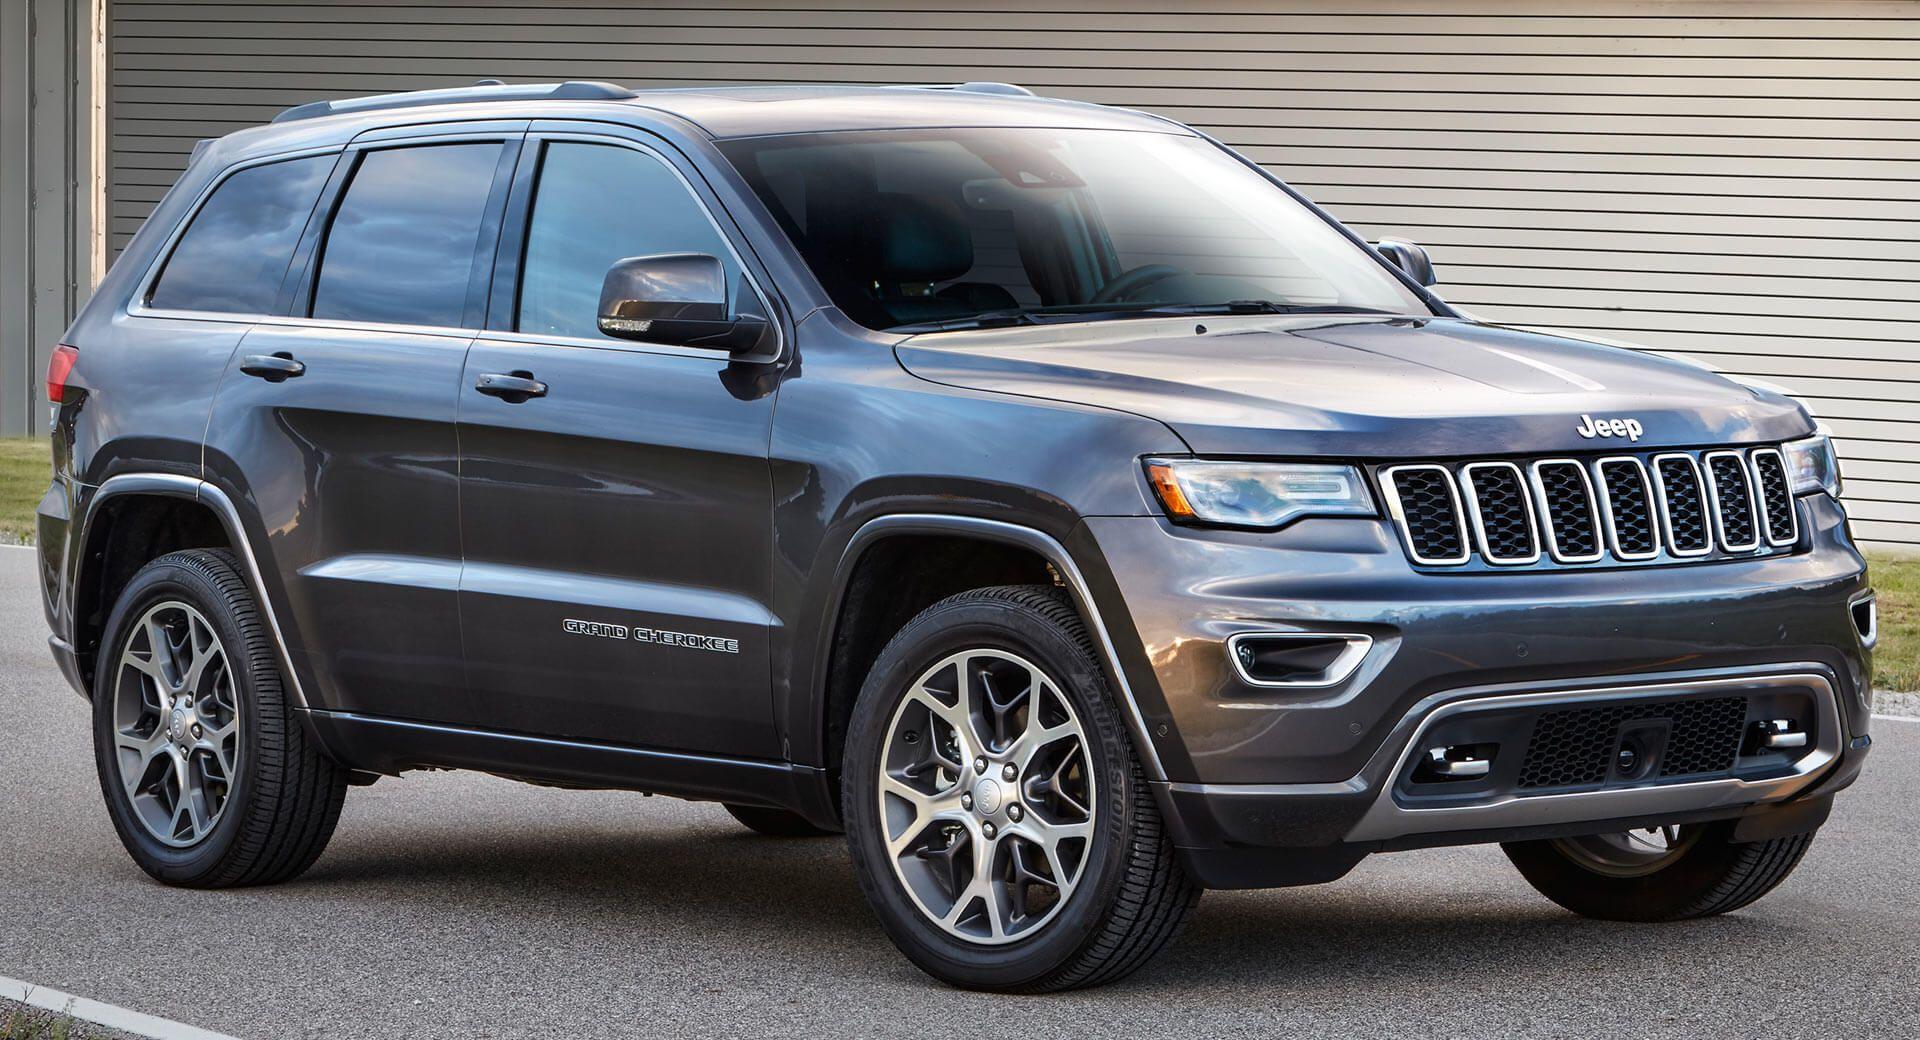 next jeep grand cherokee will ride on alfa romeo 39 s giorgio platform carscoops. Black Bedroom Furniture Sets. Home Design Ideas